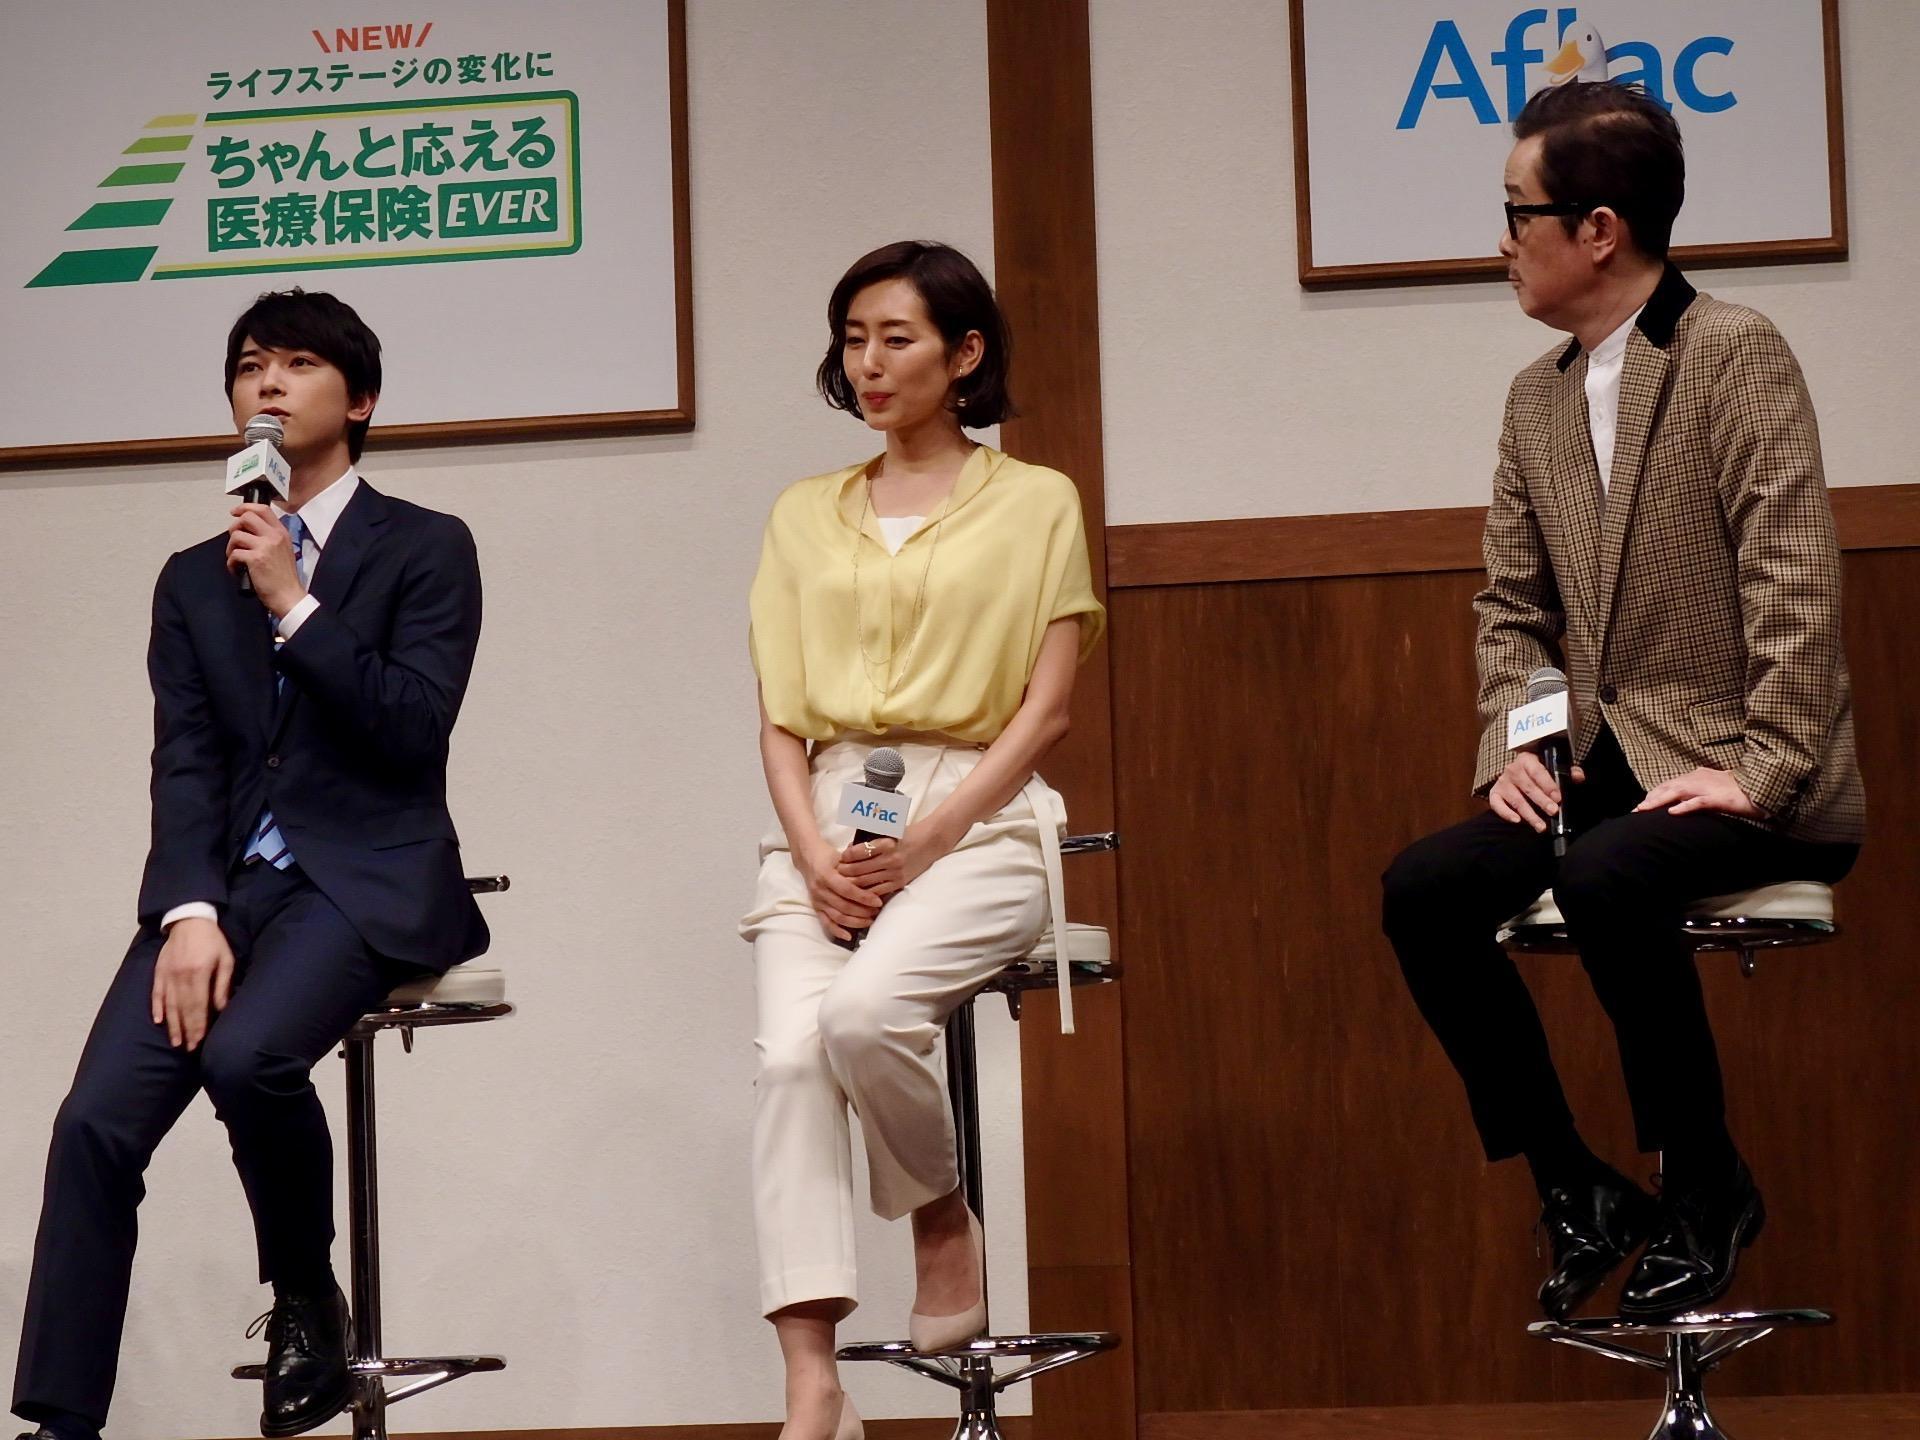 http://news.yoshimoto.co.jp/20190117185450-0d18c11c339cb87d6146e763c849071c9c6aa5ca.jpeg